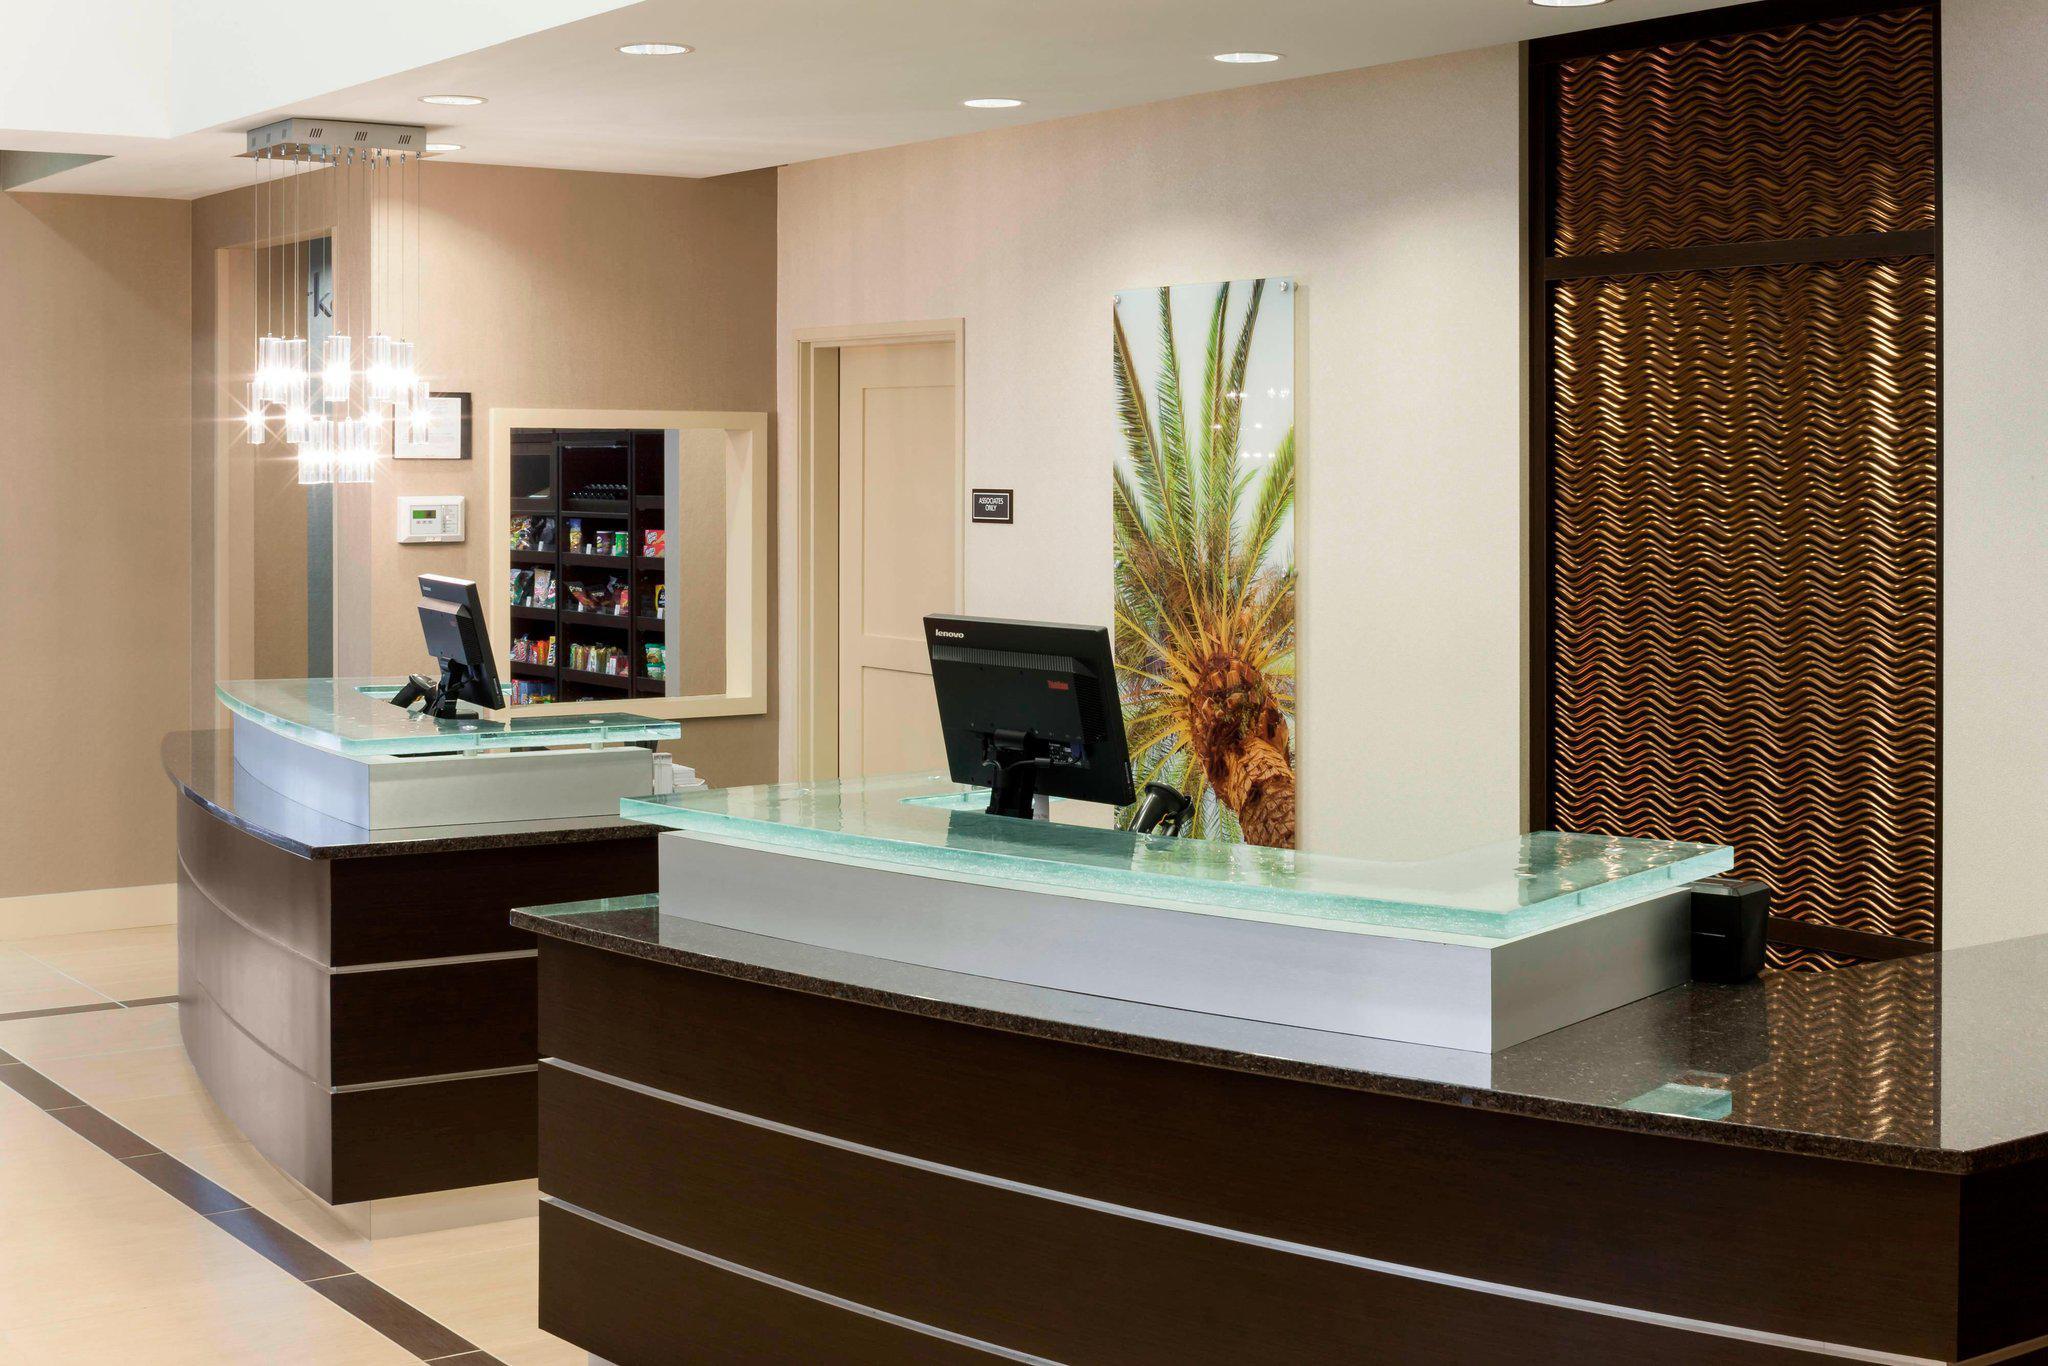 Residence Inn by Marriott Fort Lauderdale Airport & Cruise Port